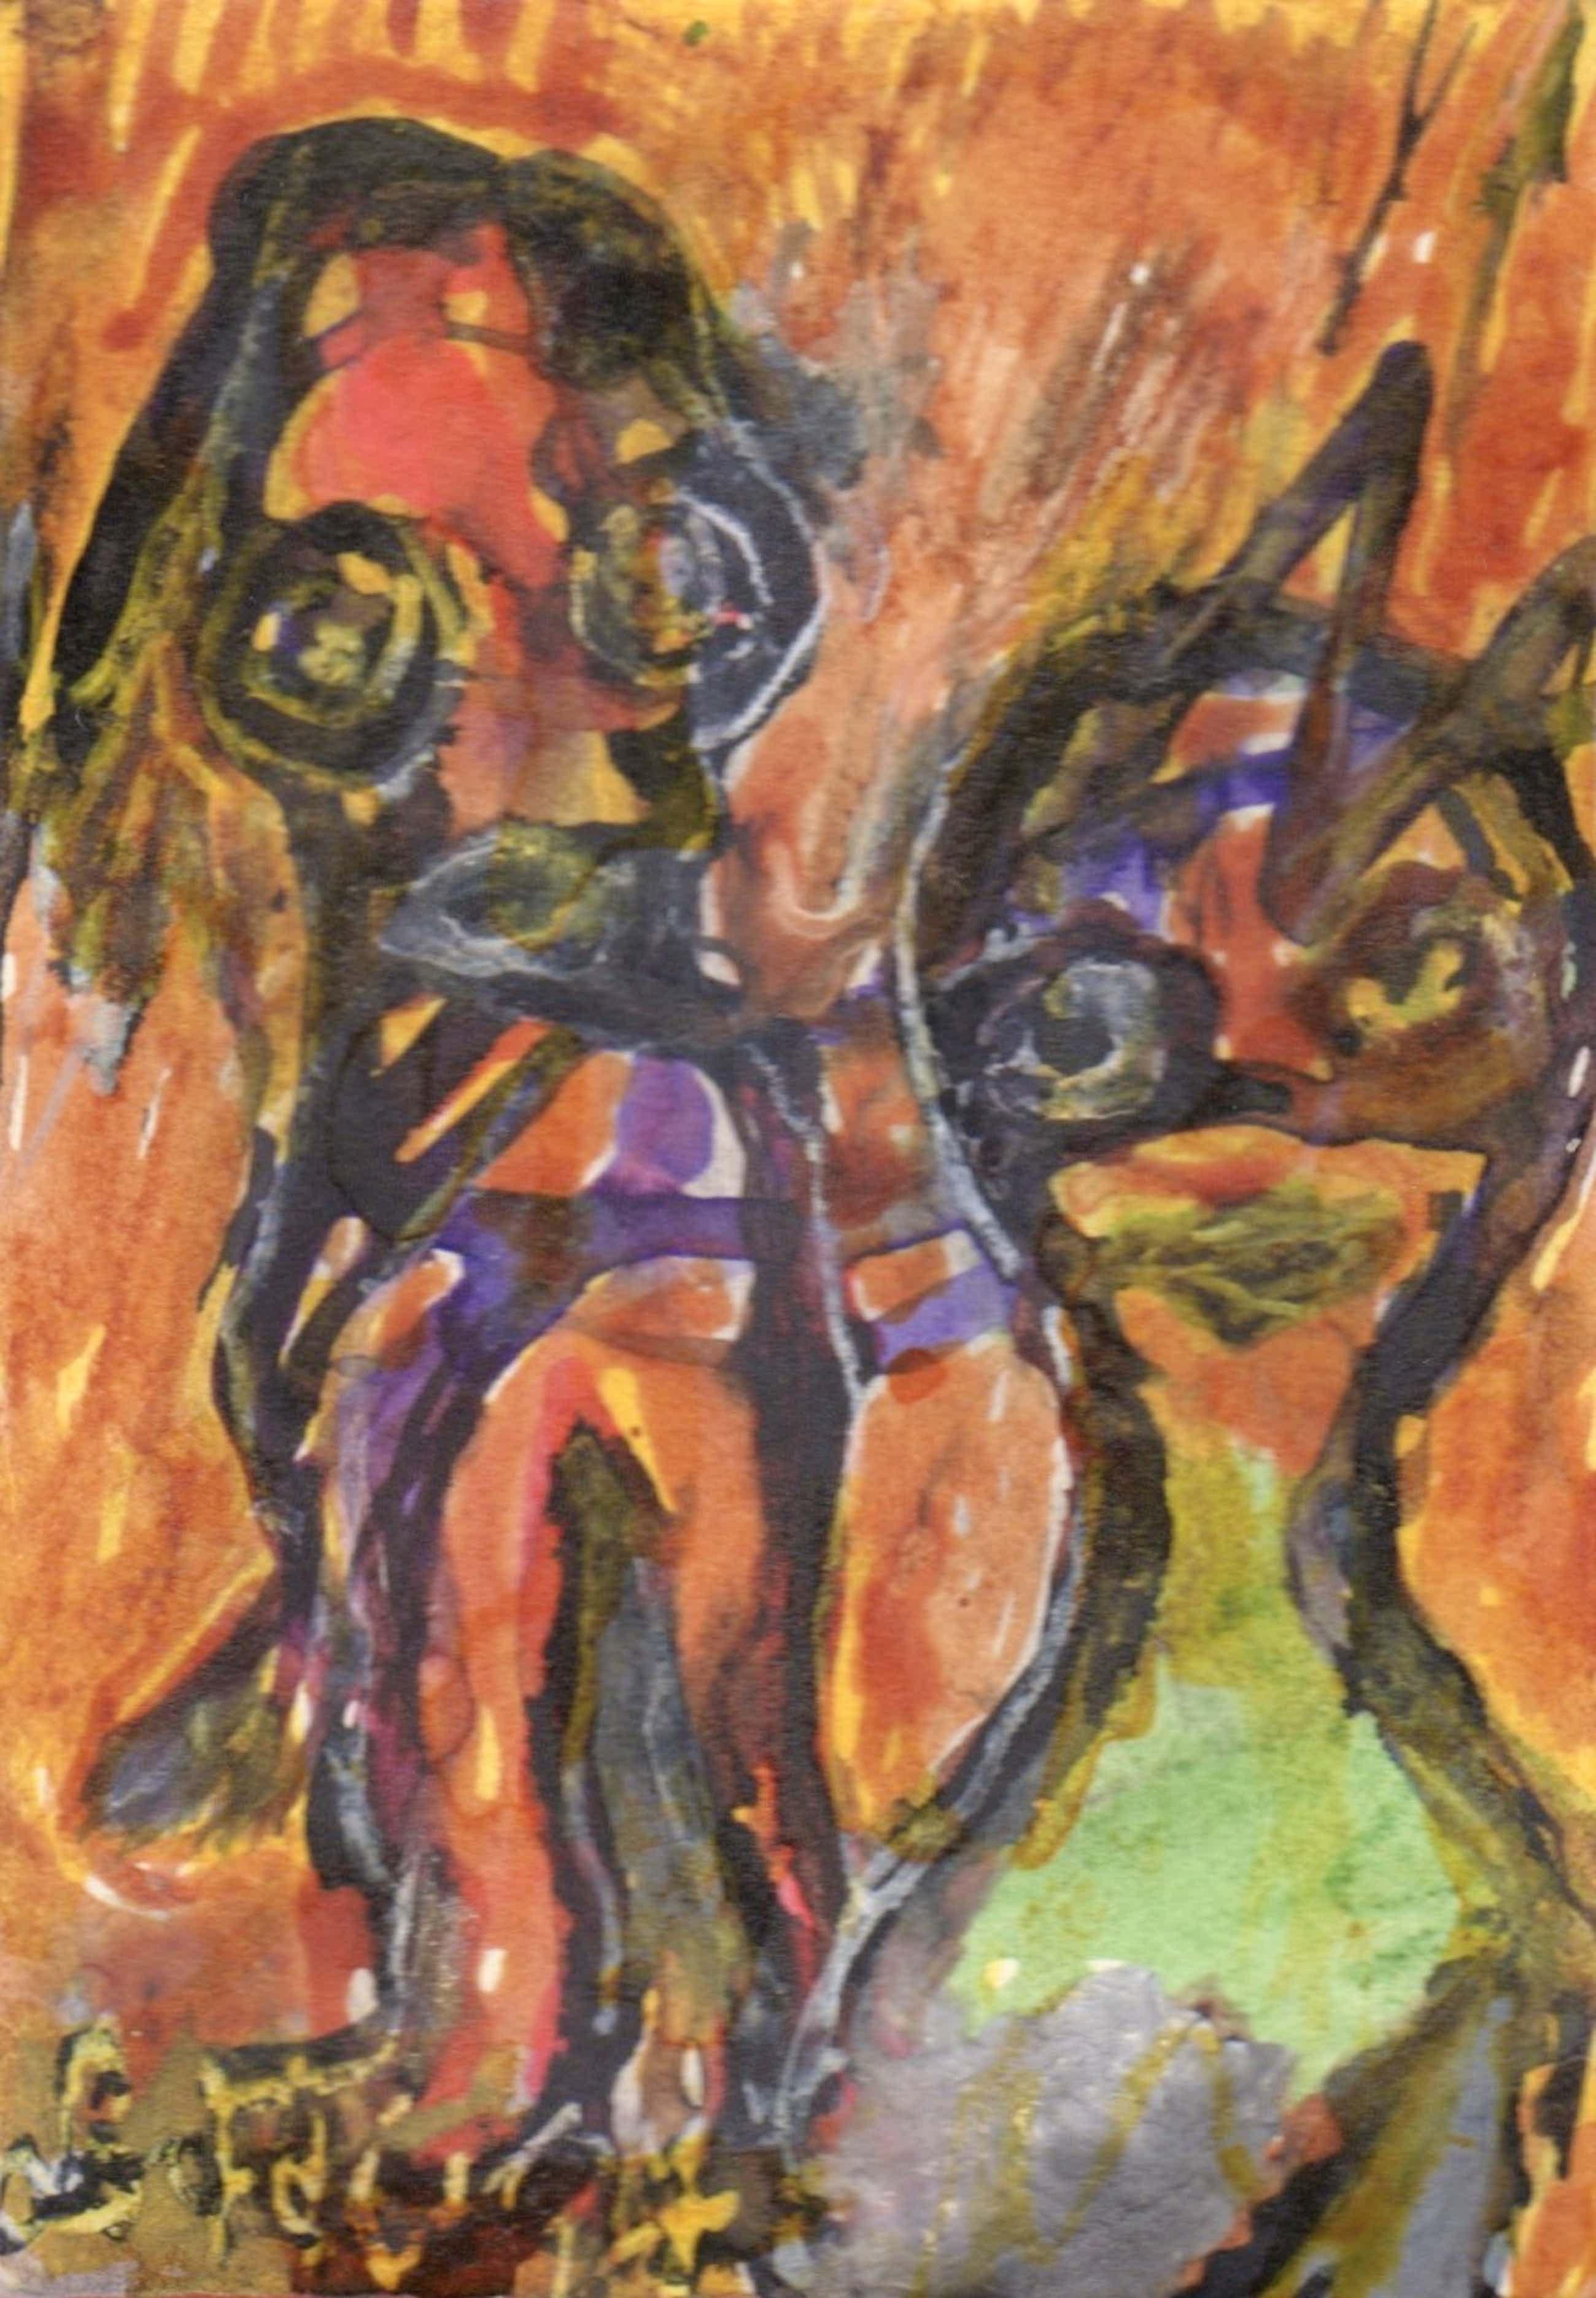 Lotti van der Gaag - gemengde techniek op papier | 'Voulez-vous dancer avec moi?' | 1997 kopen? Bied vanaf 300!